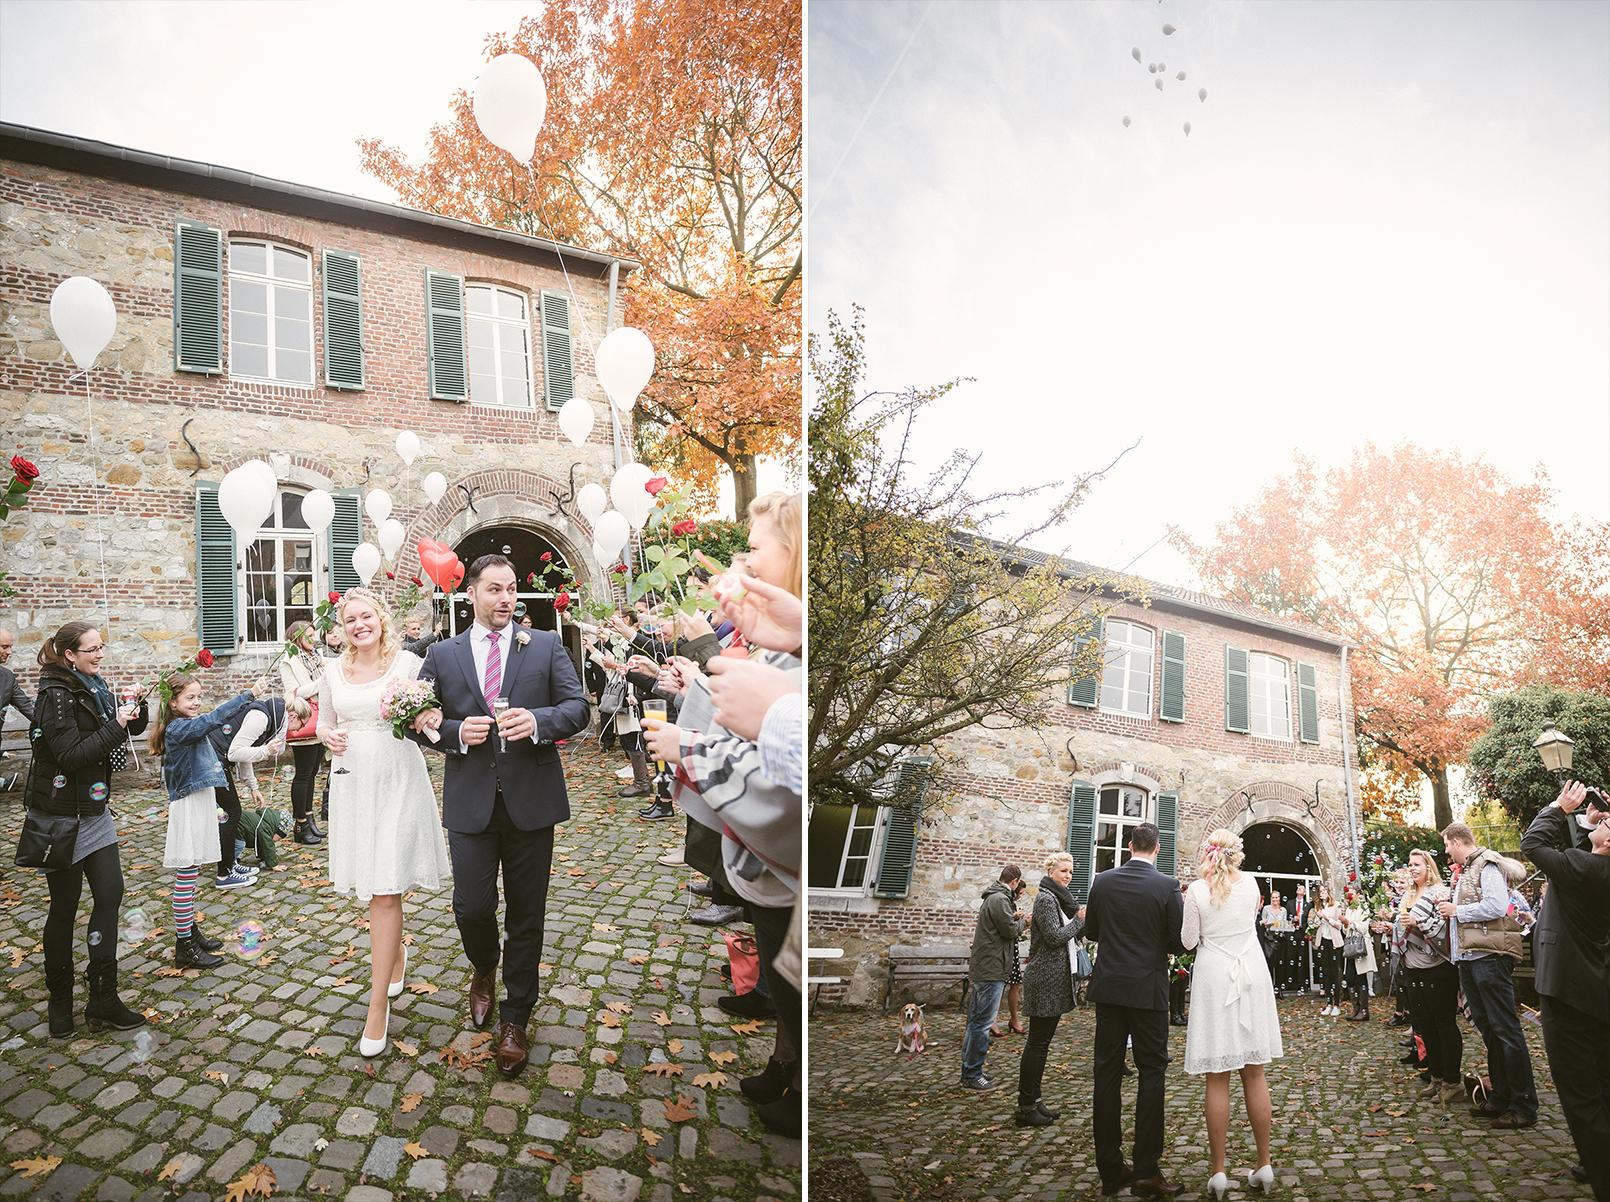 Hochzeitsfotograf-Aachen-Dreamcatcher-Photography-Katharina-Nils-Fotografie-0025